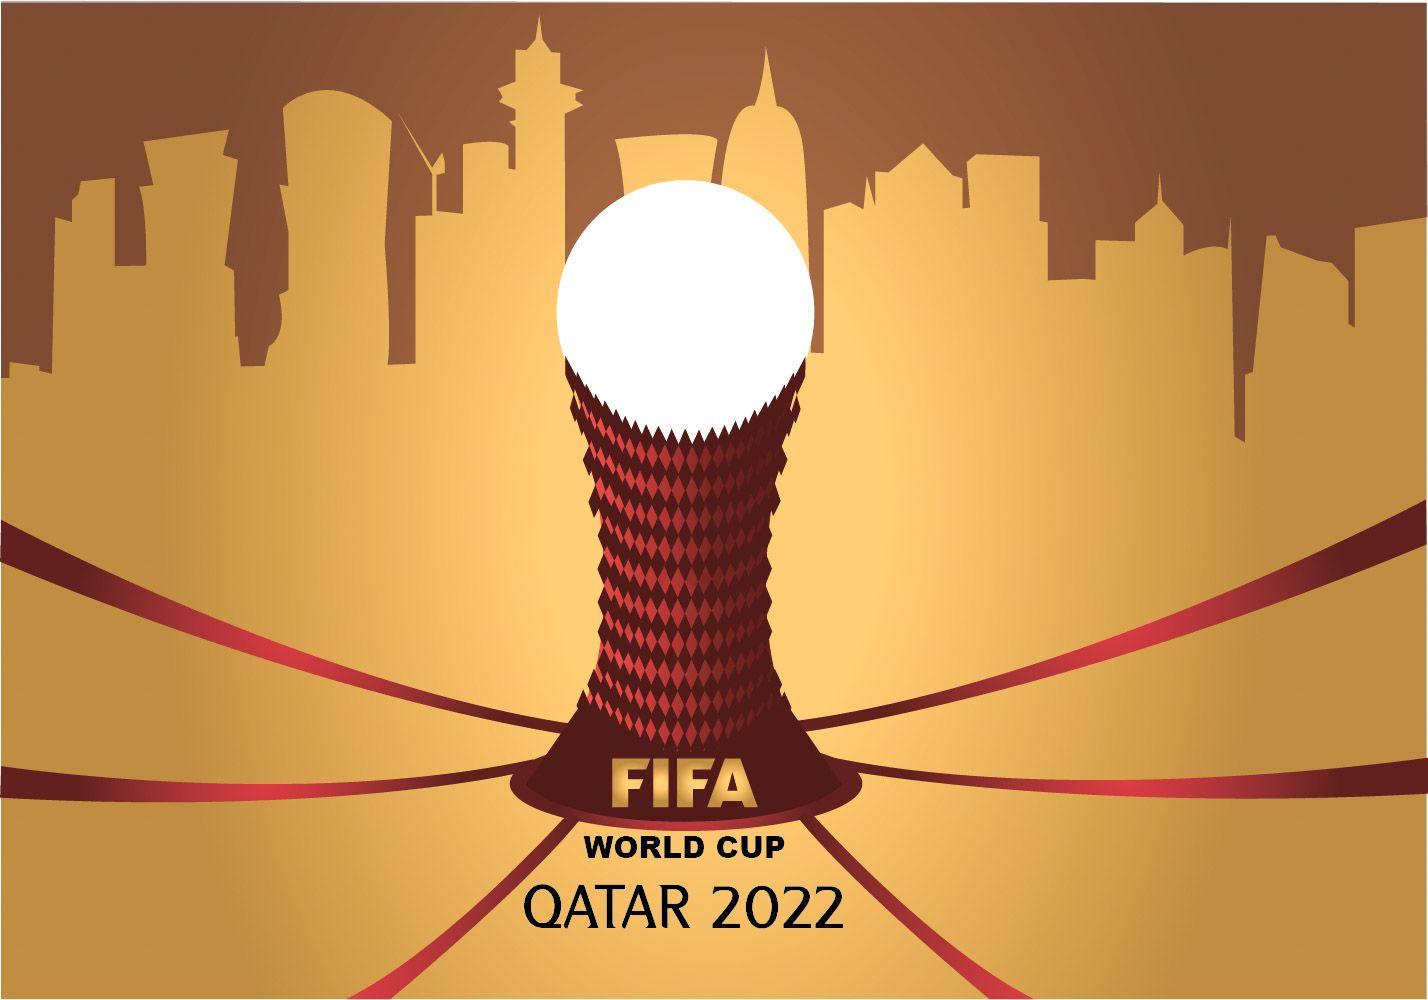 Fifa World Cup Poster Qatar 2022 Brand Creation Futebol Soccer Futebol